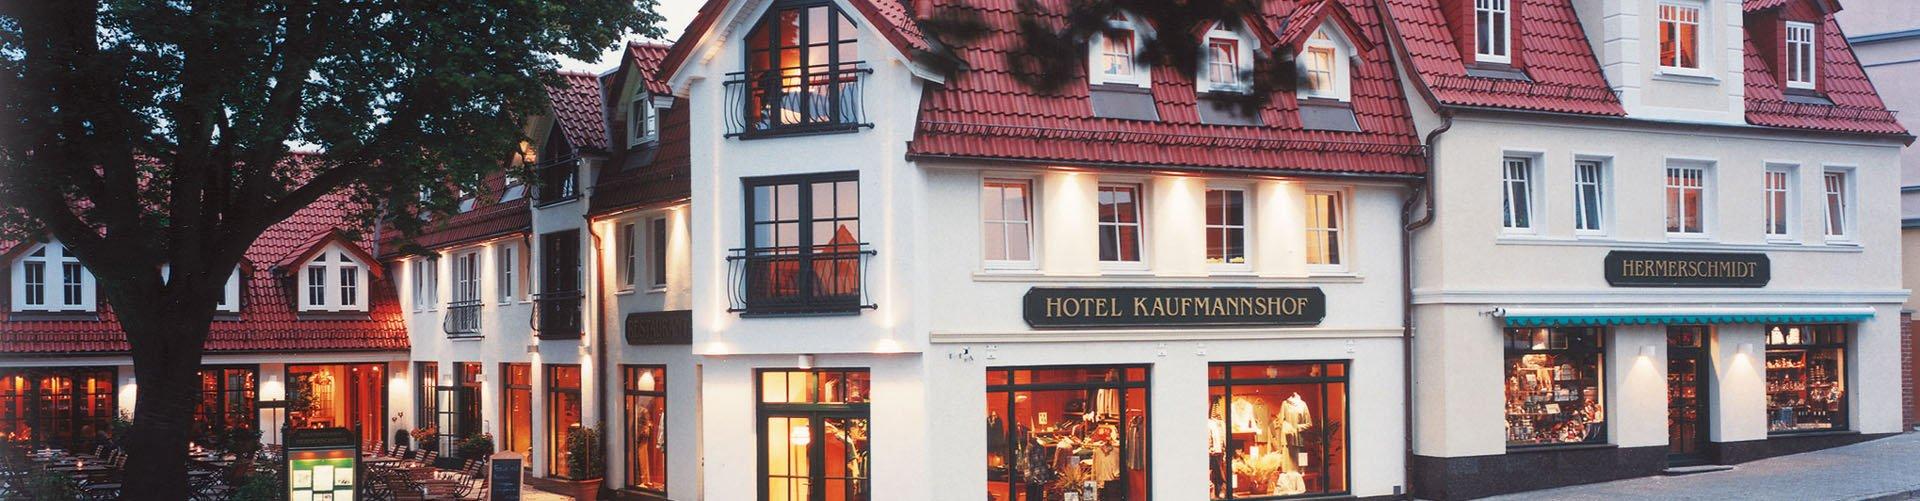 Hotel Kaufmannshof - Rügen